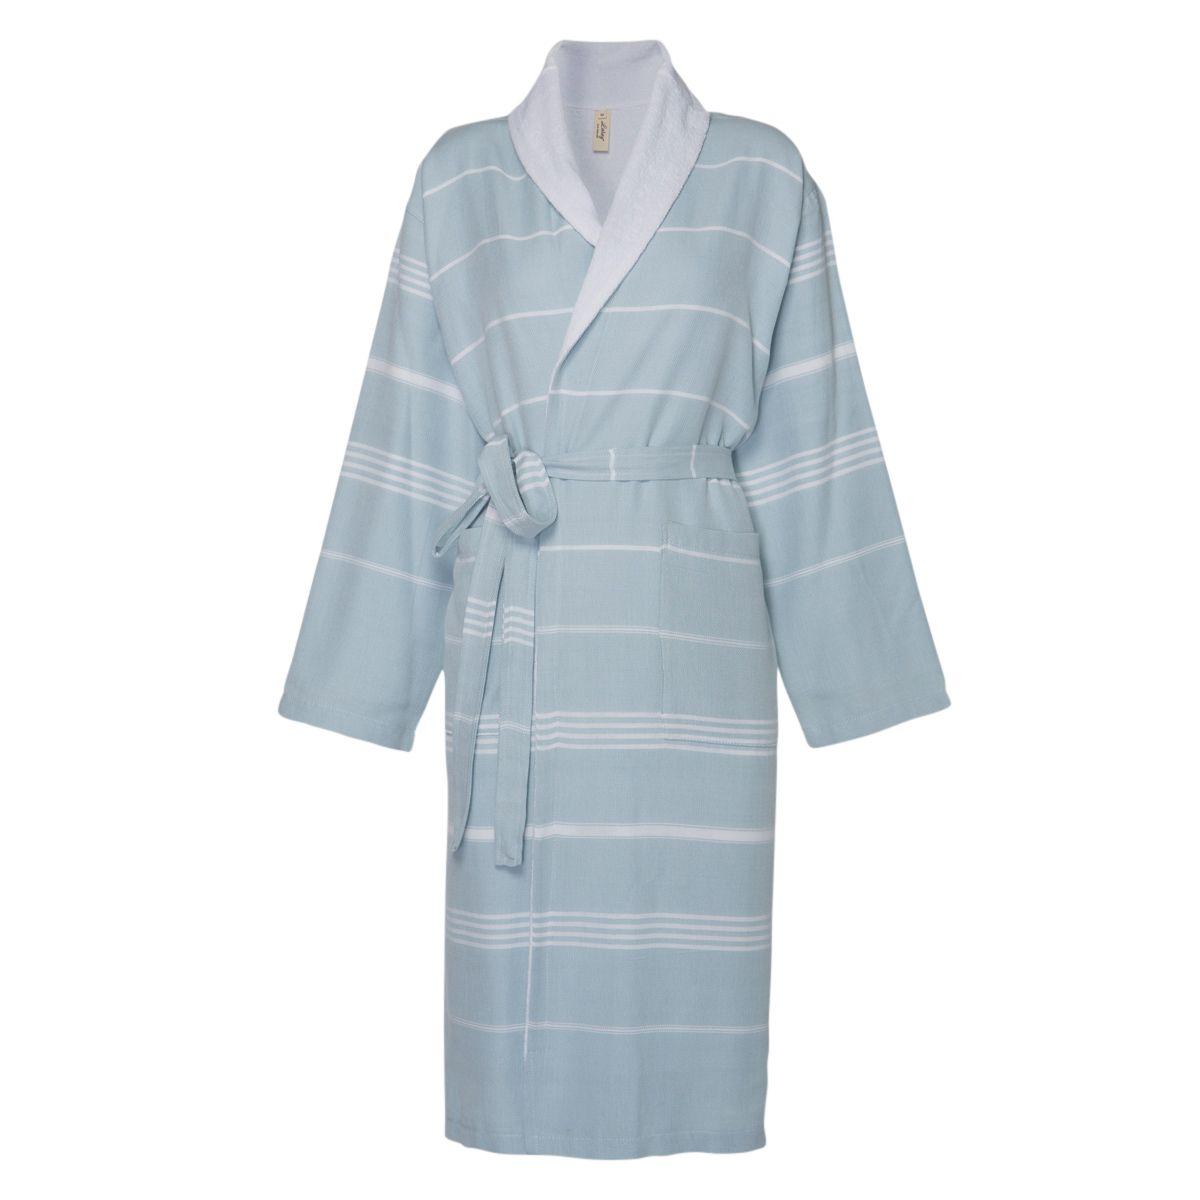 Bathrobe Leyla / With Towel Lining - Light Blue